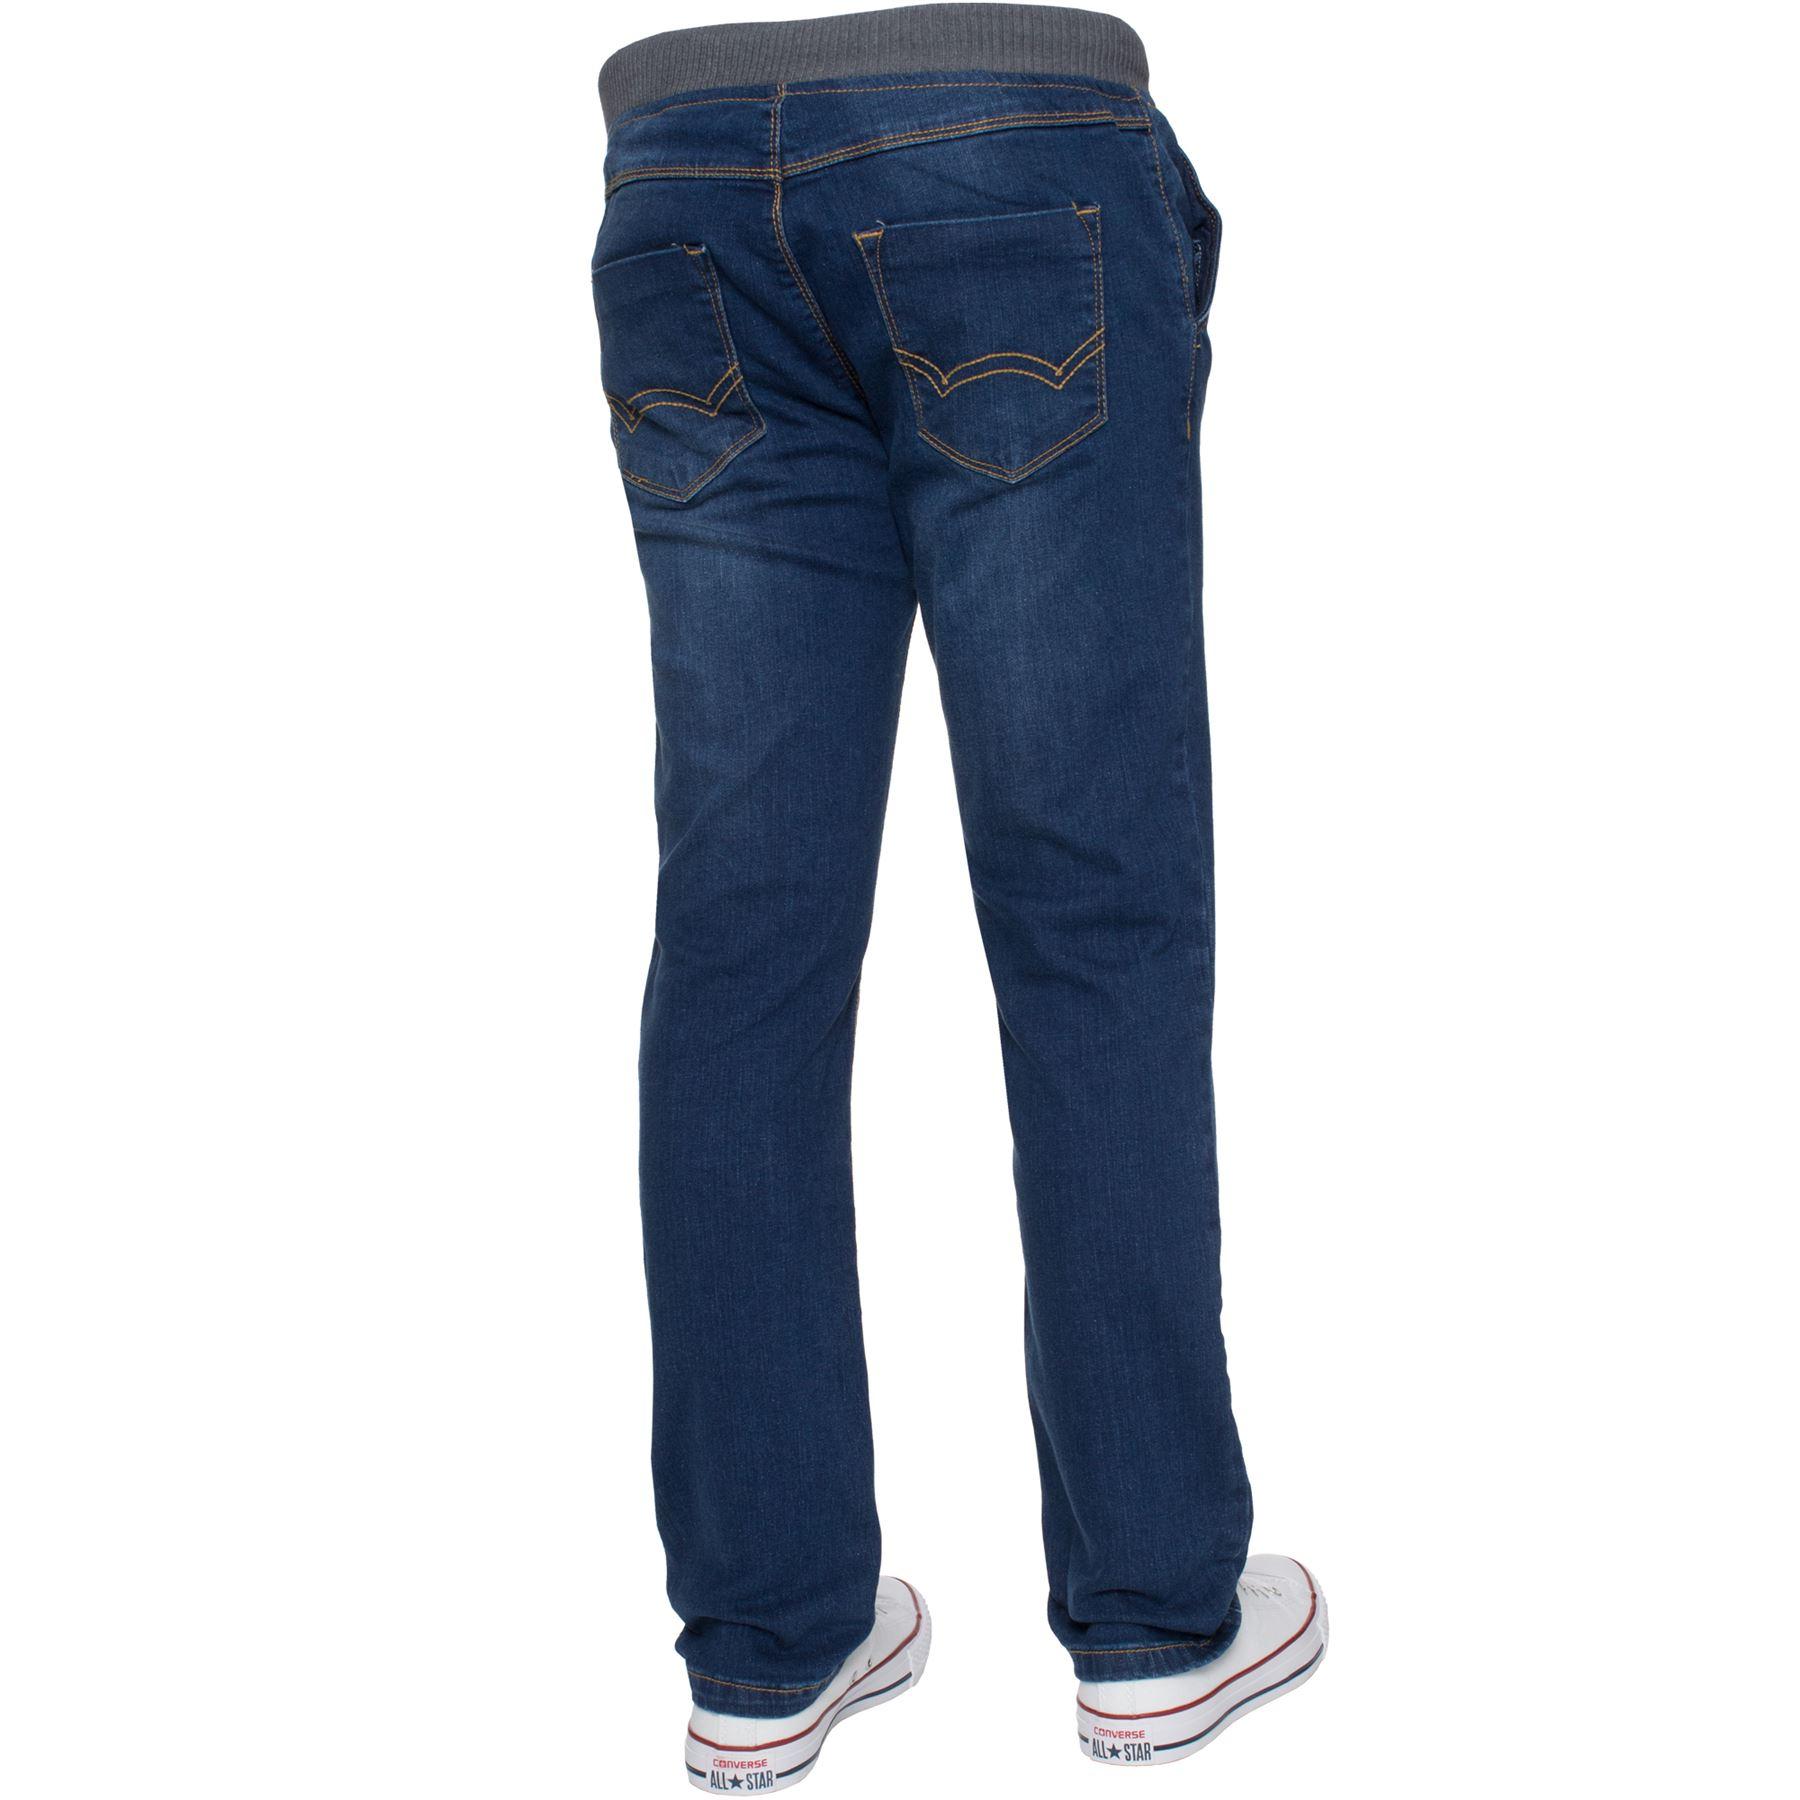 Jean-Garcon-Taille-Elastique-Enfants-Skinny-Stretch-School-Denim-Pantalon-Pantalon miniature 8